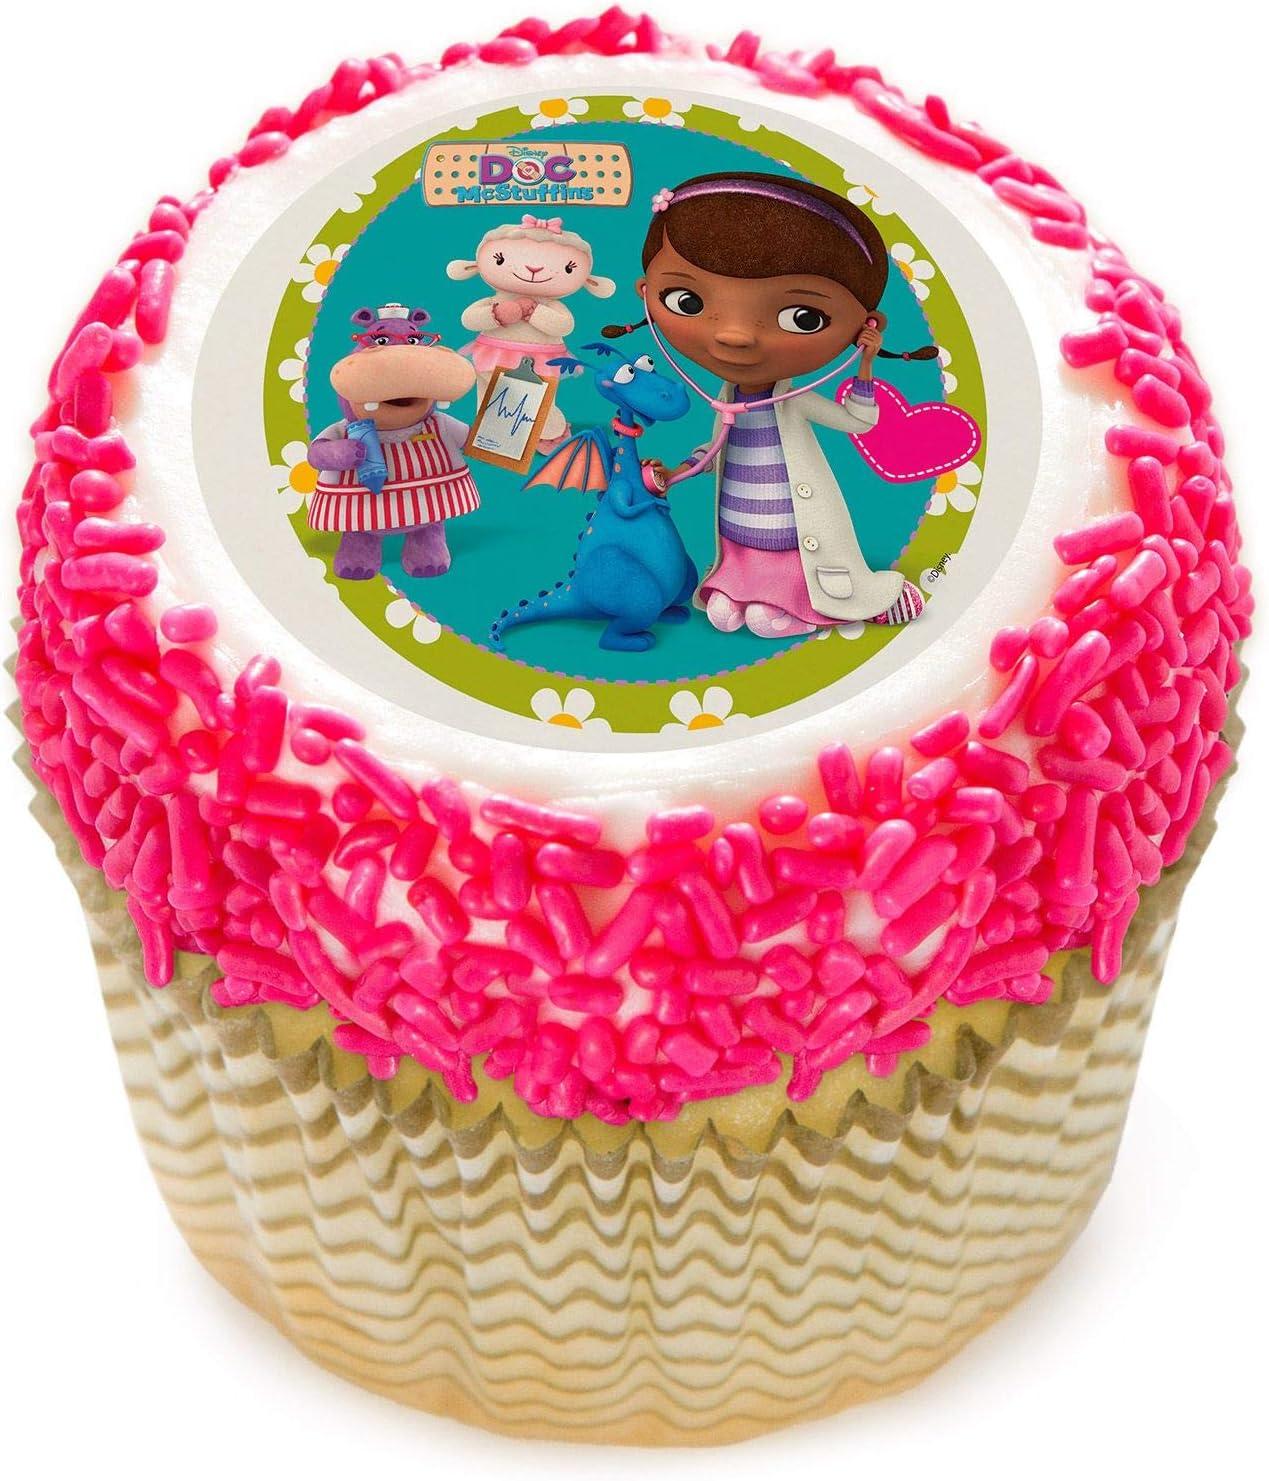 Fabulous Amazon Com Doc Mcstuffins 2 Edible Cupcake Topper 12 Images Funny Birthday Cards Online Elaedamsfinfo